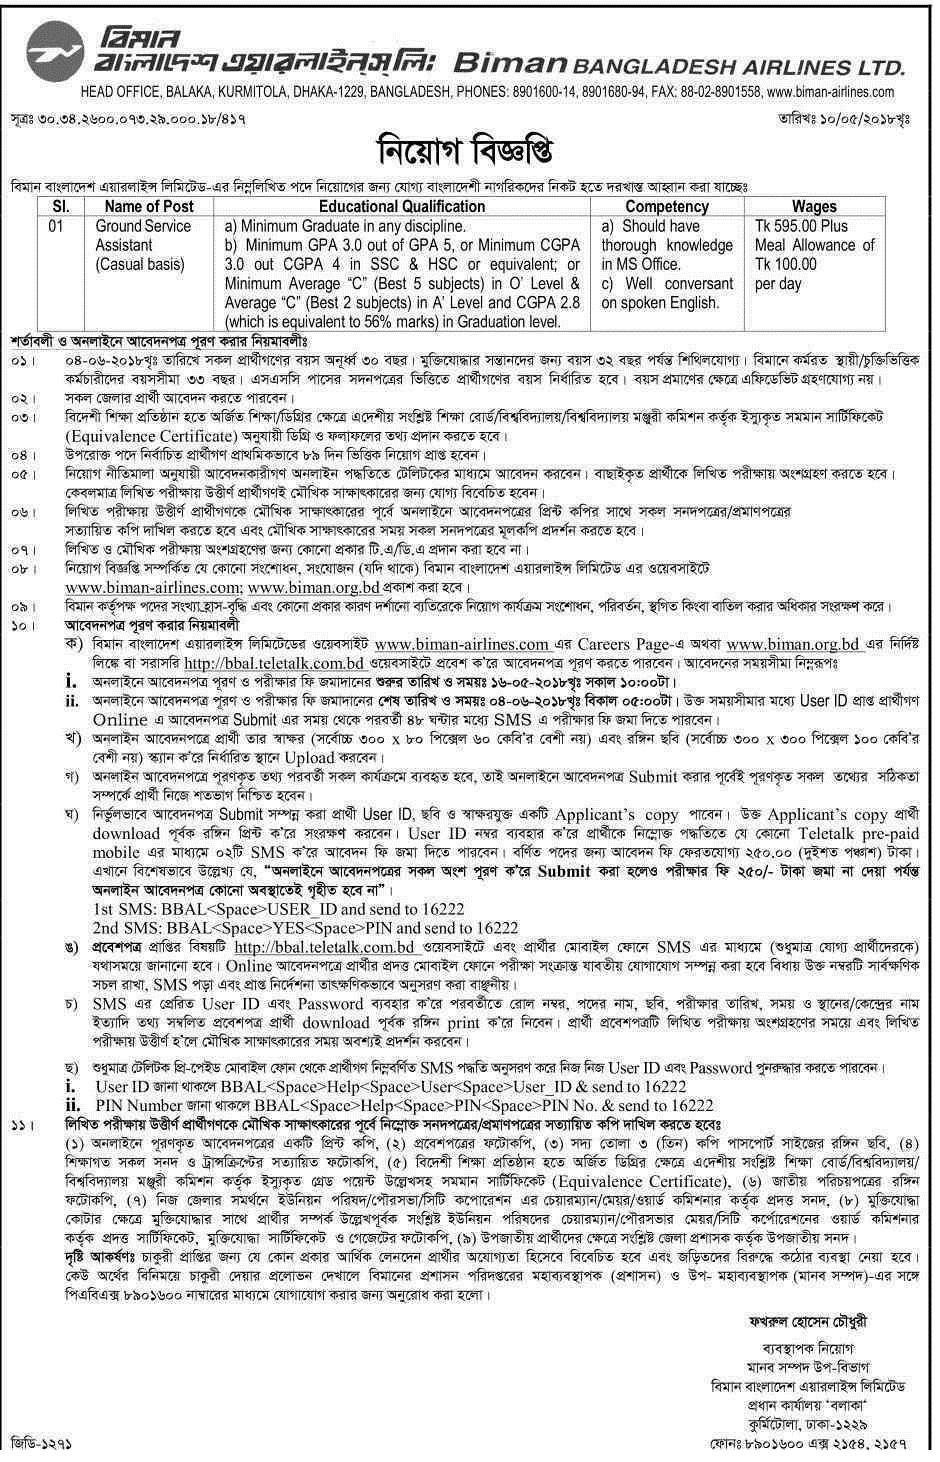 BIMAN BANGLADESH AIRLINES LTD JOB CIRCULAR 3018